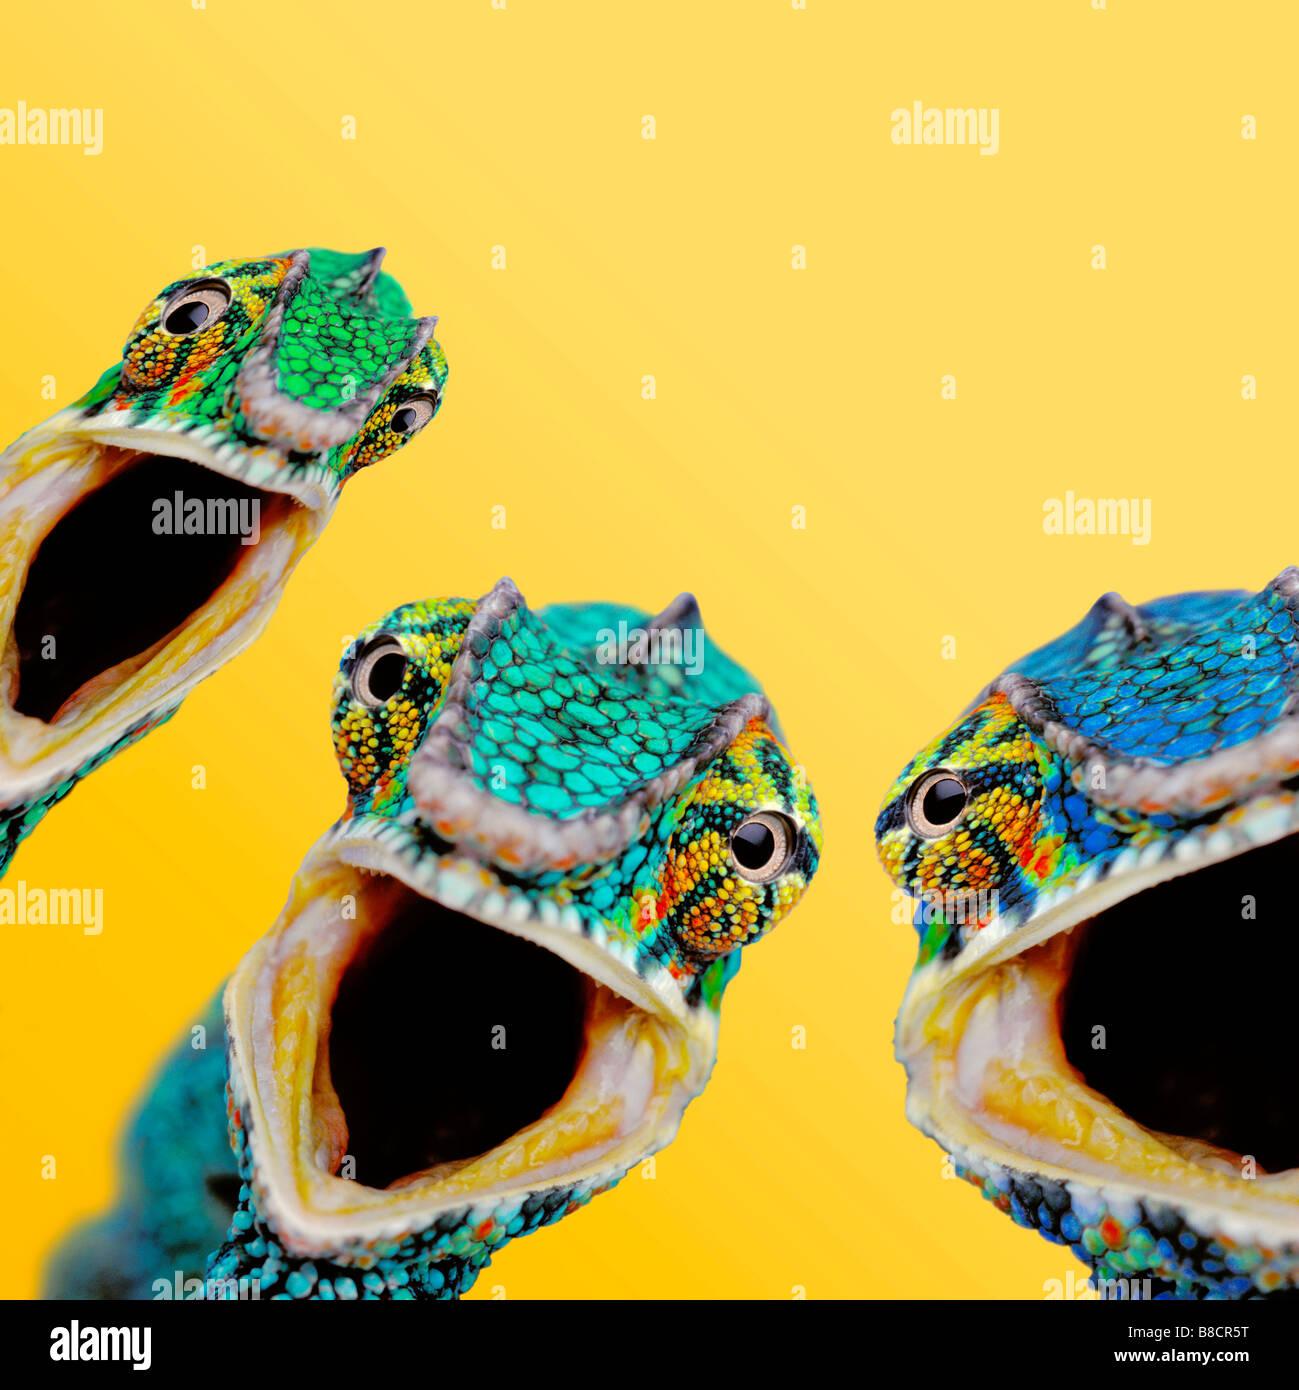 FL6516, Kitchin/Hurst; trois surpris des caméléons, fond jaune Photo Stock